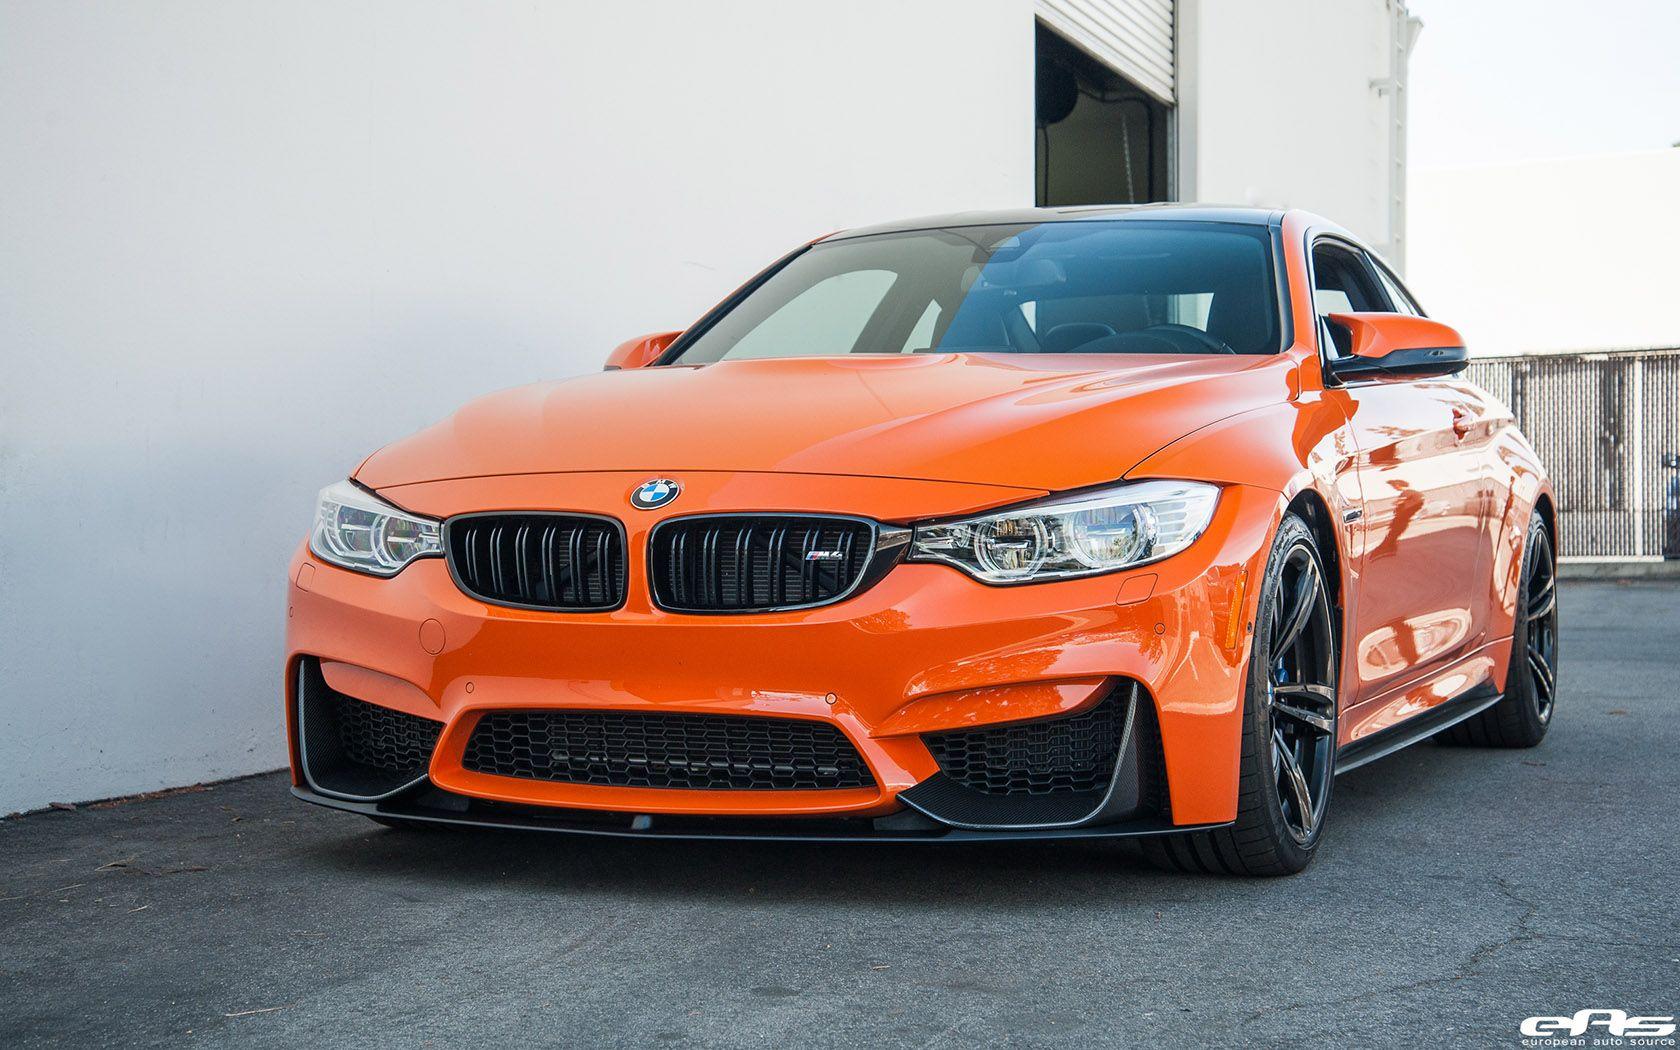 Fire Orange Ii Bmw F82 M4 Gets Modded And Refined Bmw Bmw M4 Orange Car